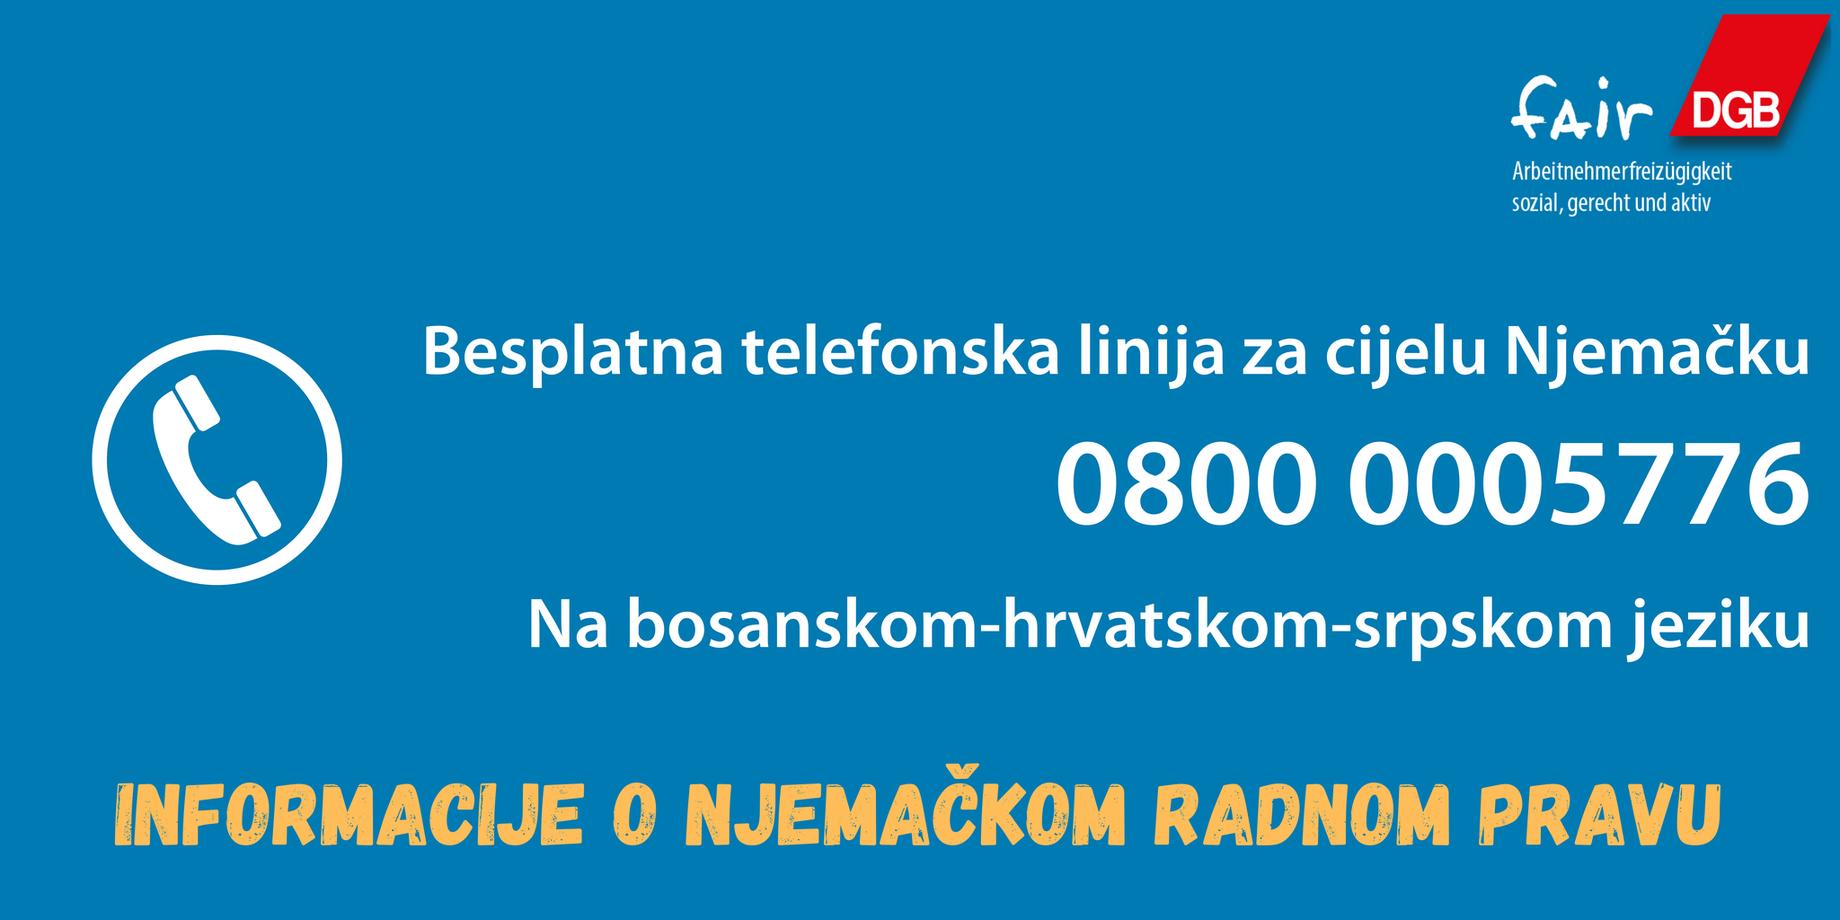 Hotline Coronavirus Arbeitsrecht BKS